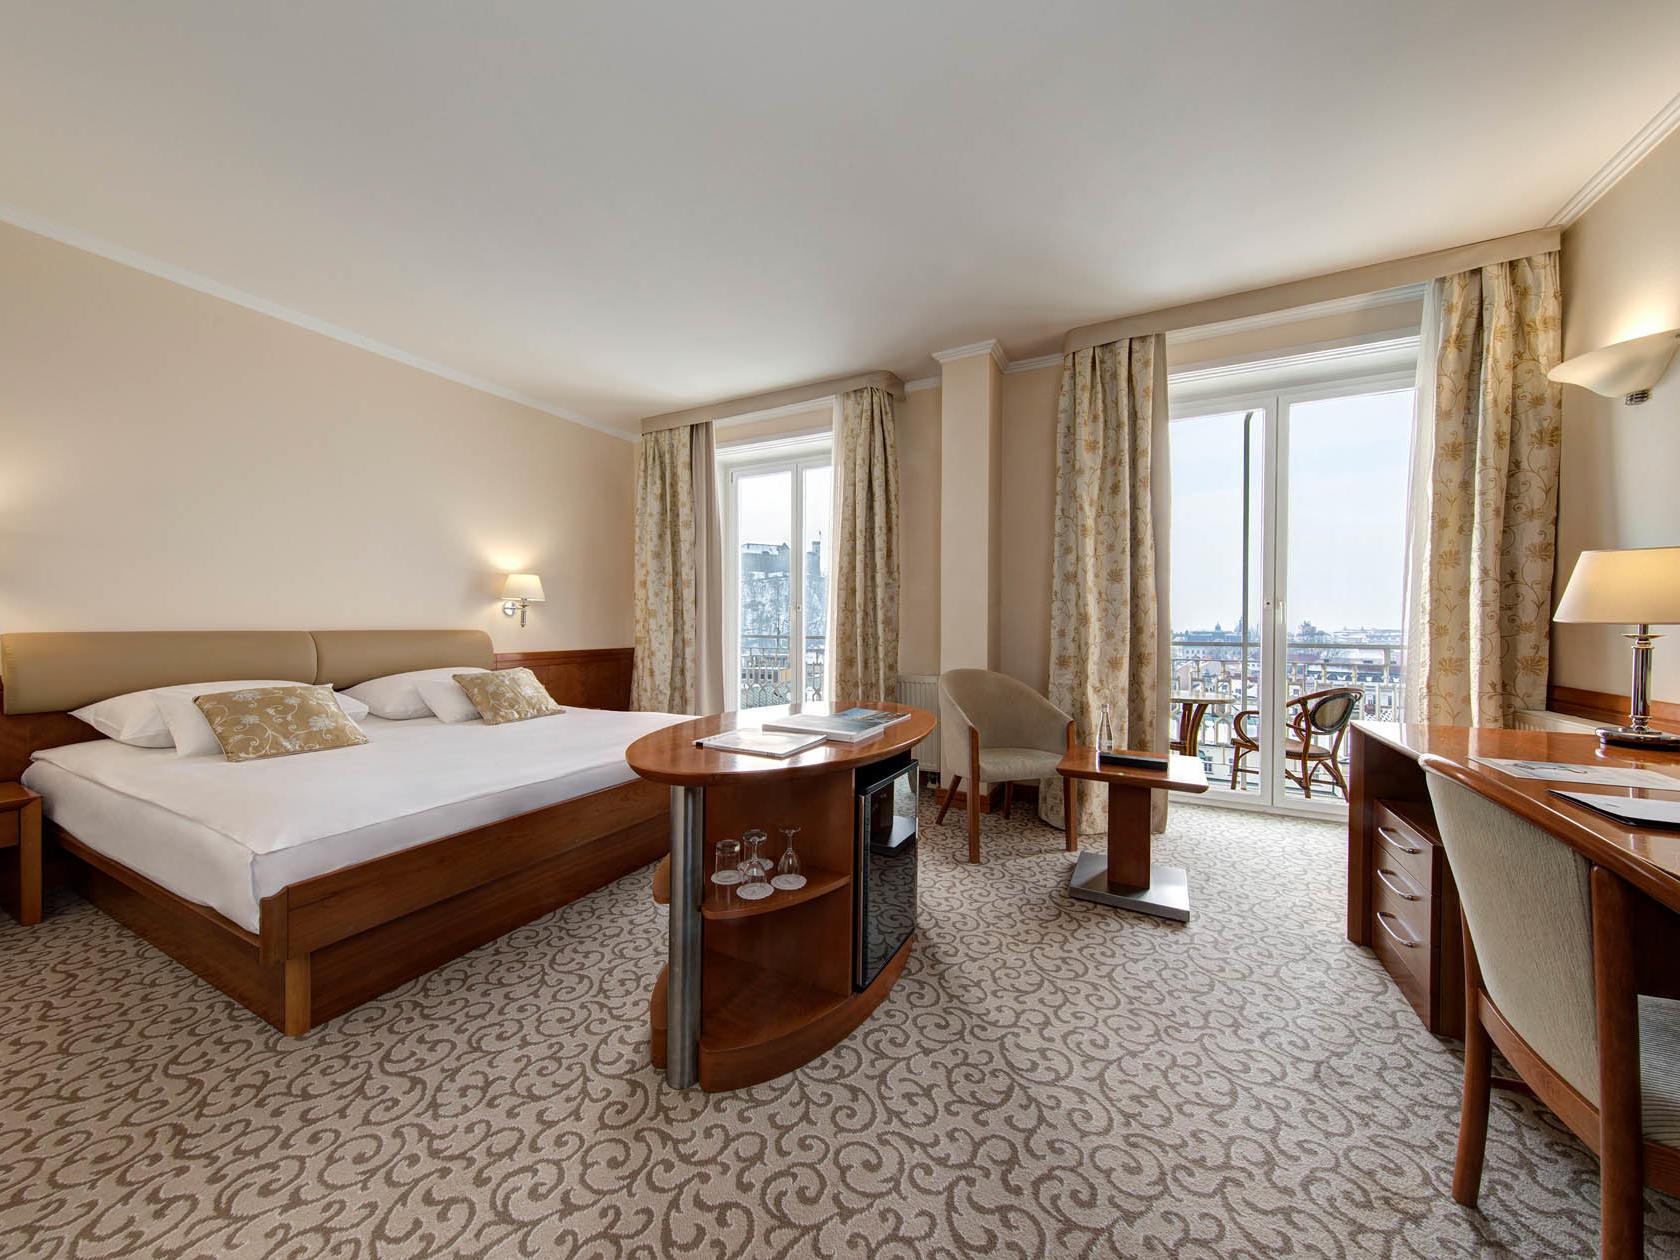 Double Room Castle View at Grand Hotel Union in Ljubljana